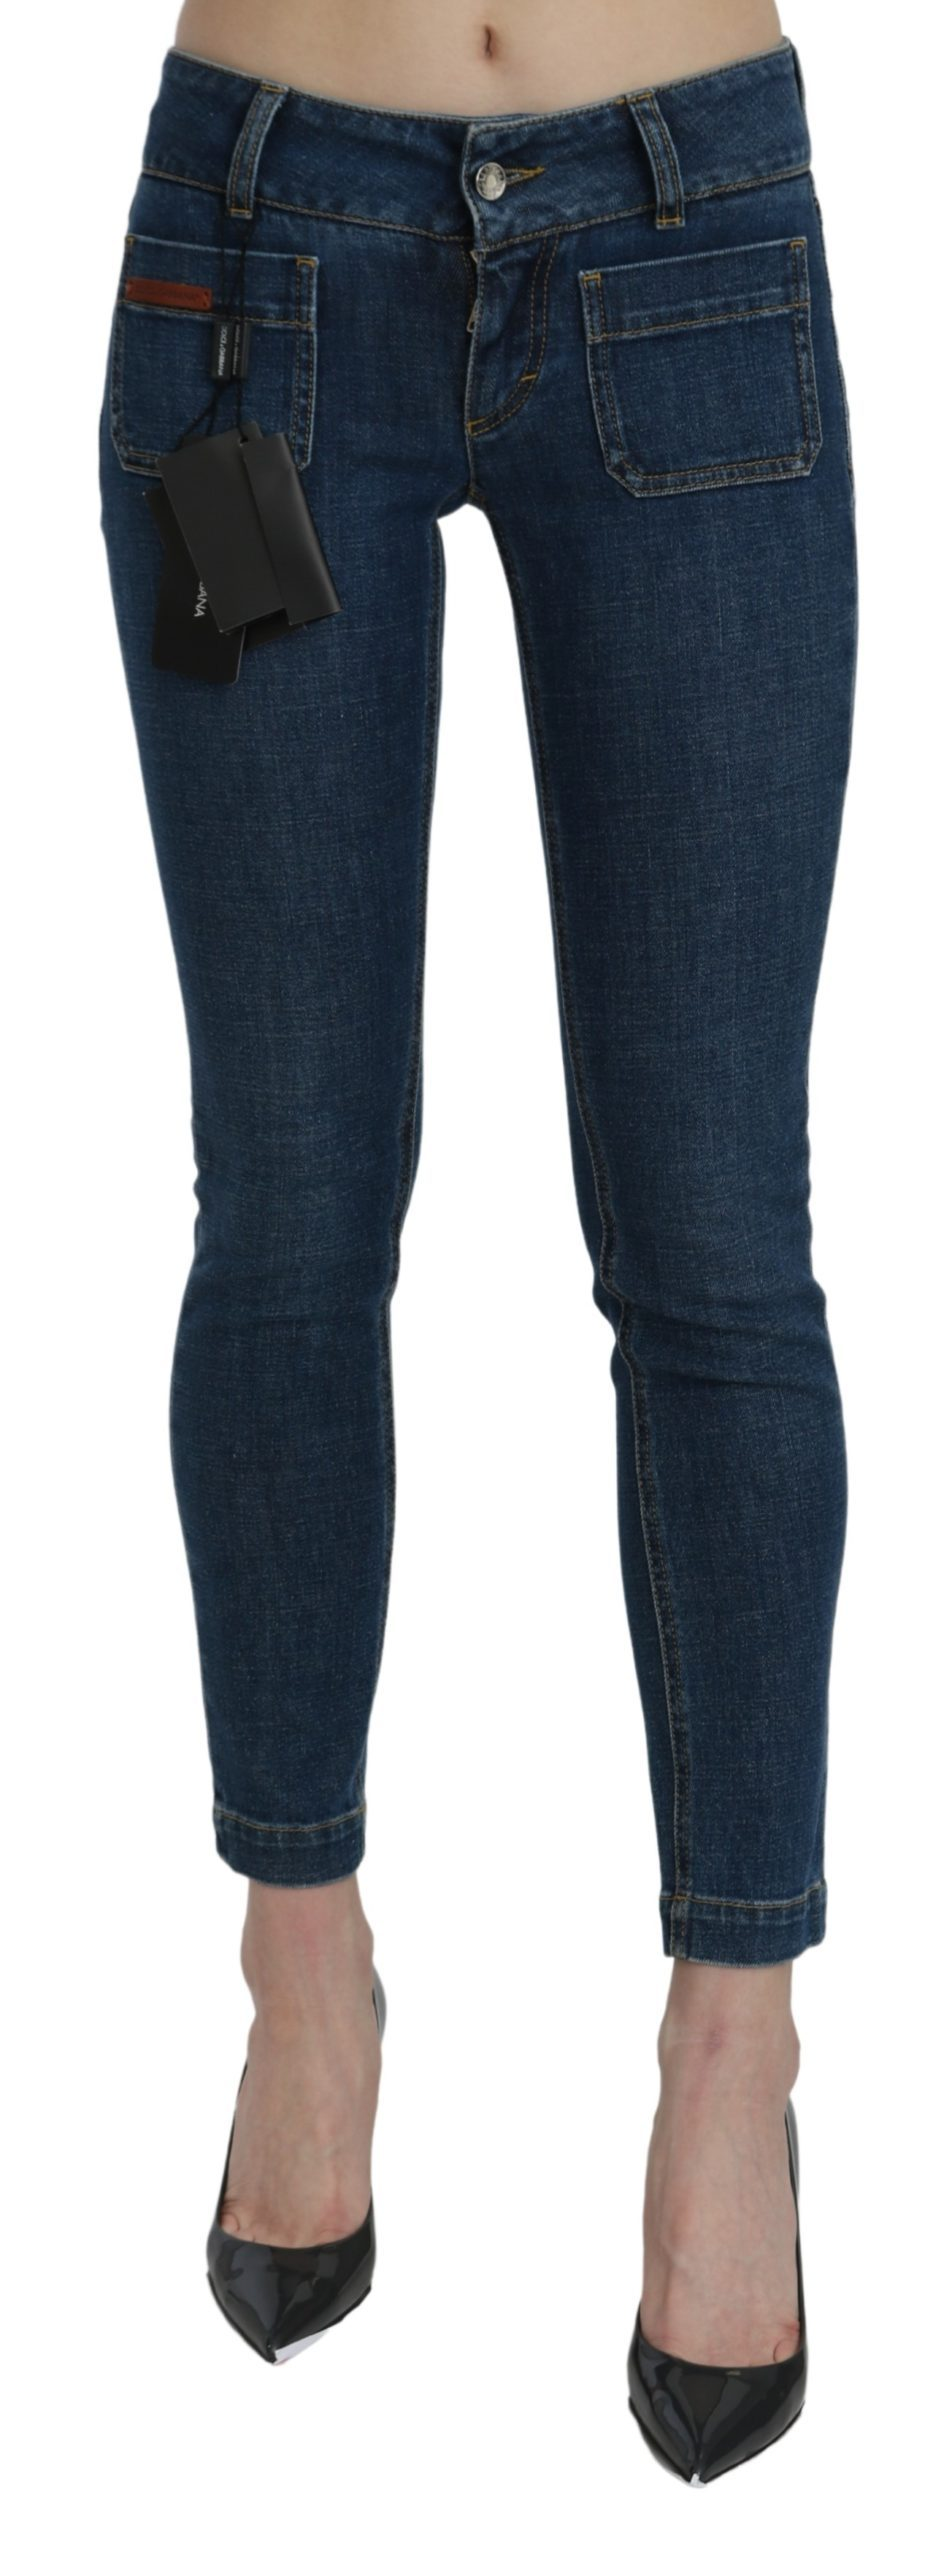 Dolce & Gabbana Women's Slim Fit Cropped Waist Denim Jeans PAN71062 - IT46|XL